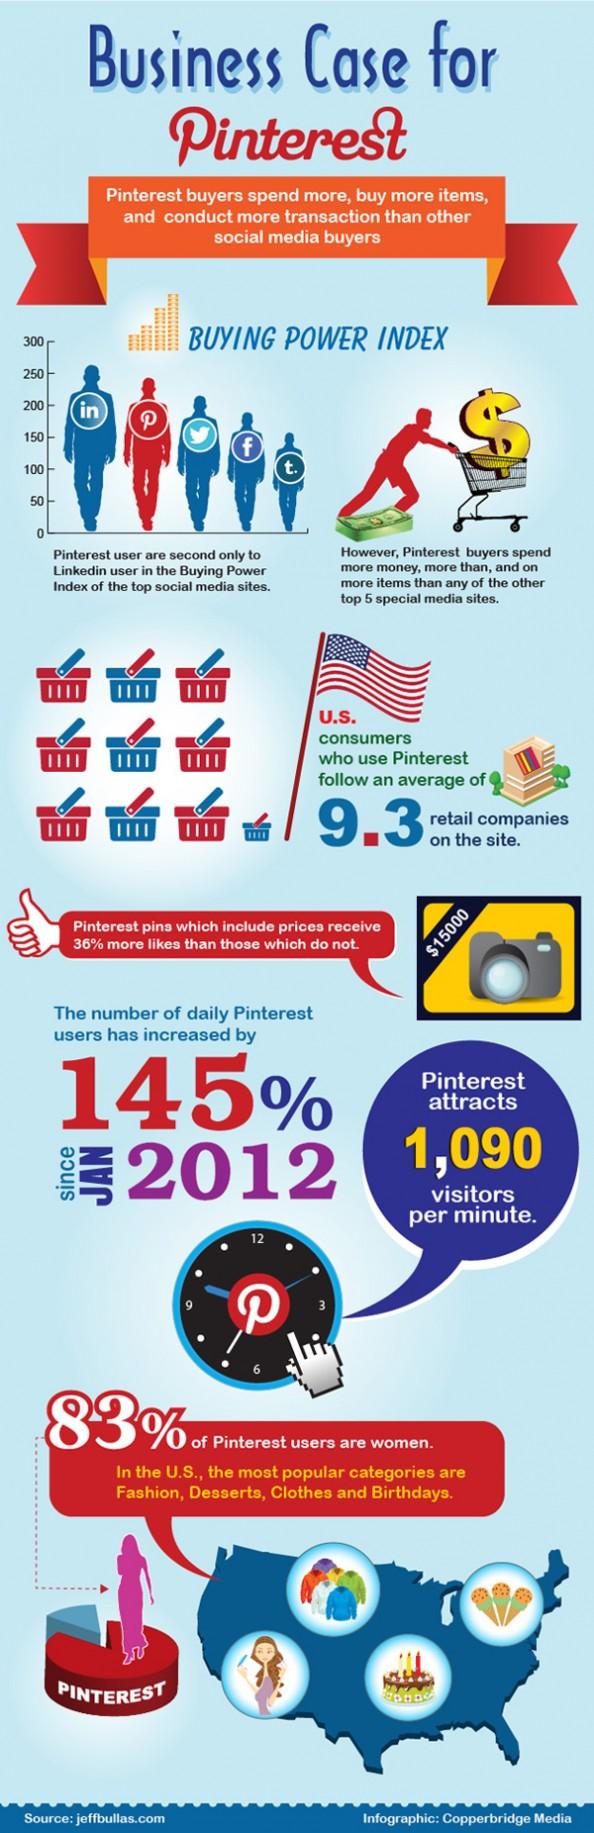 Business Case for #Pinterest: Fact or Fluff?